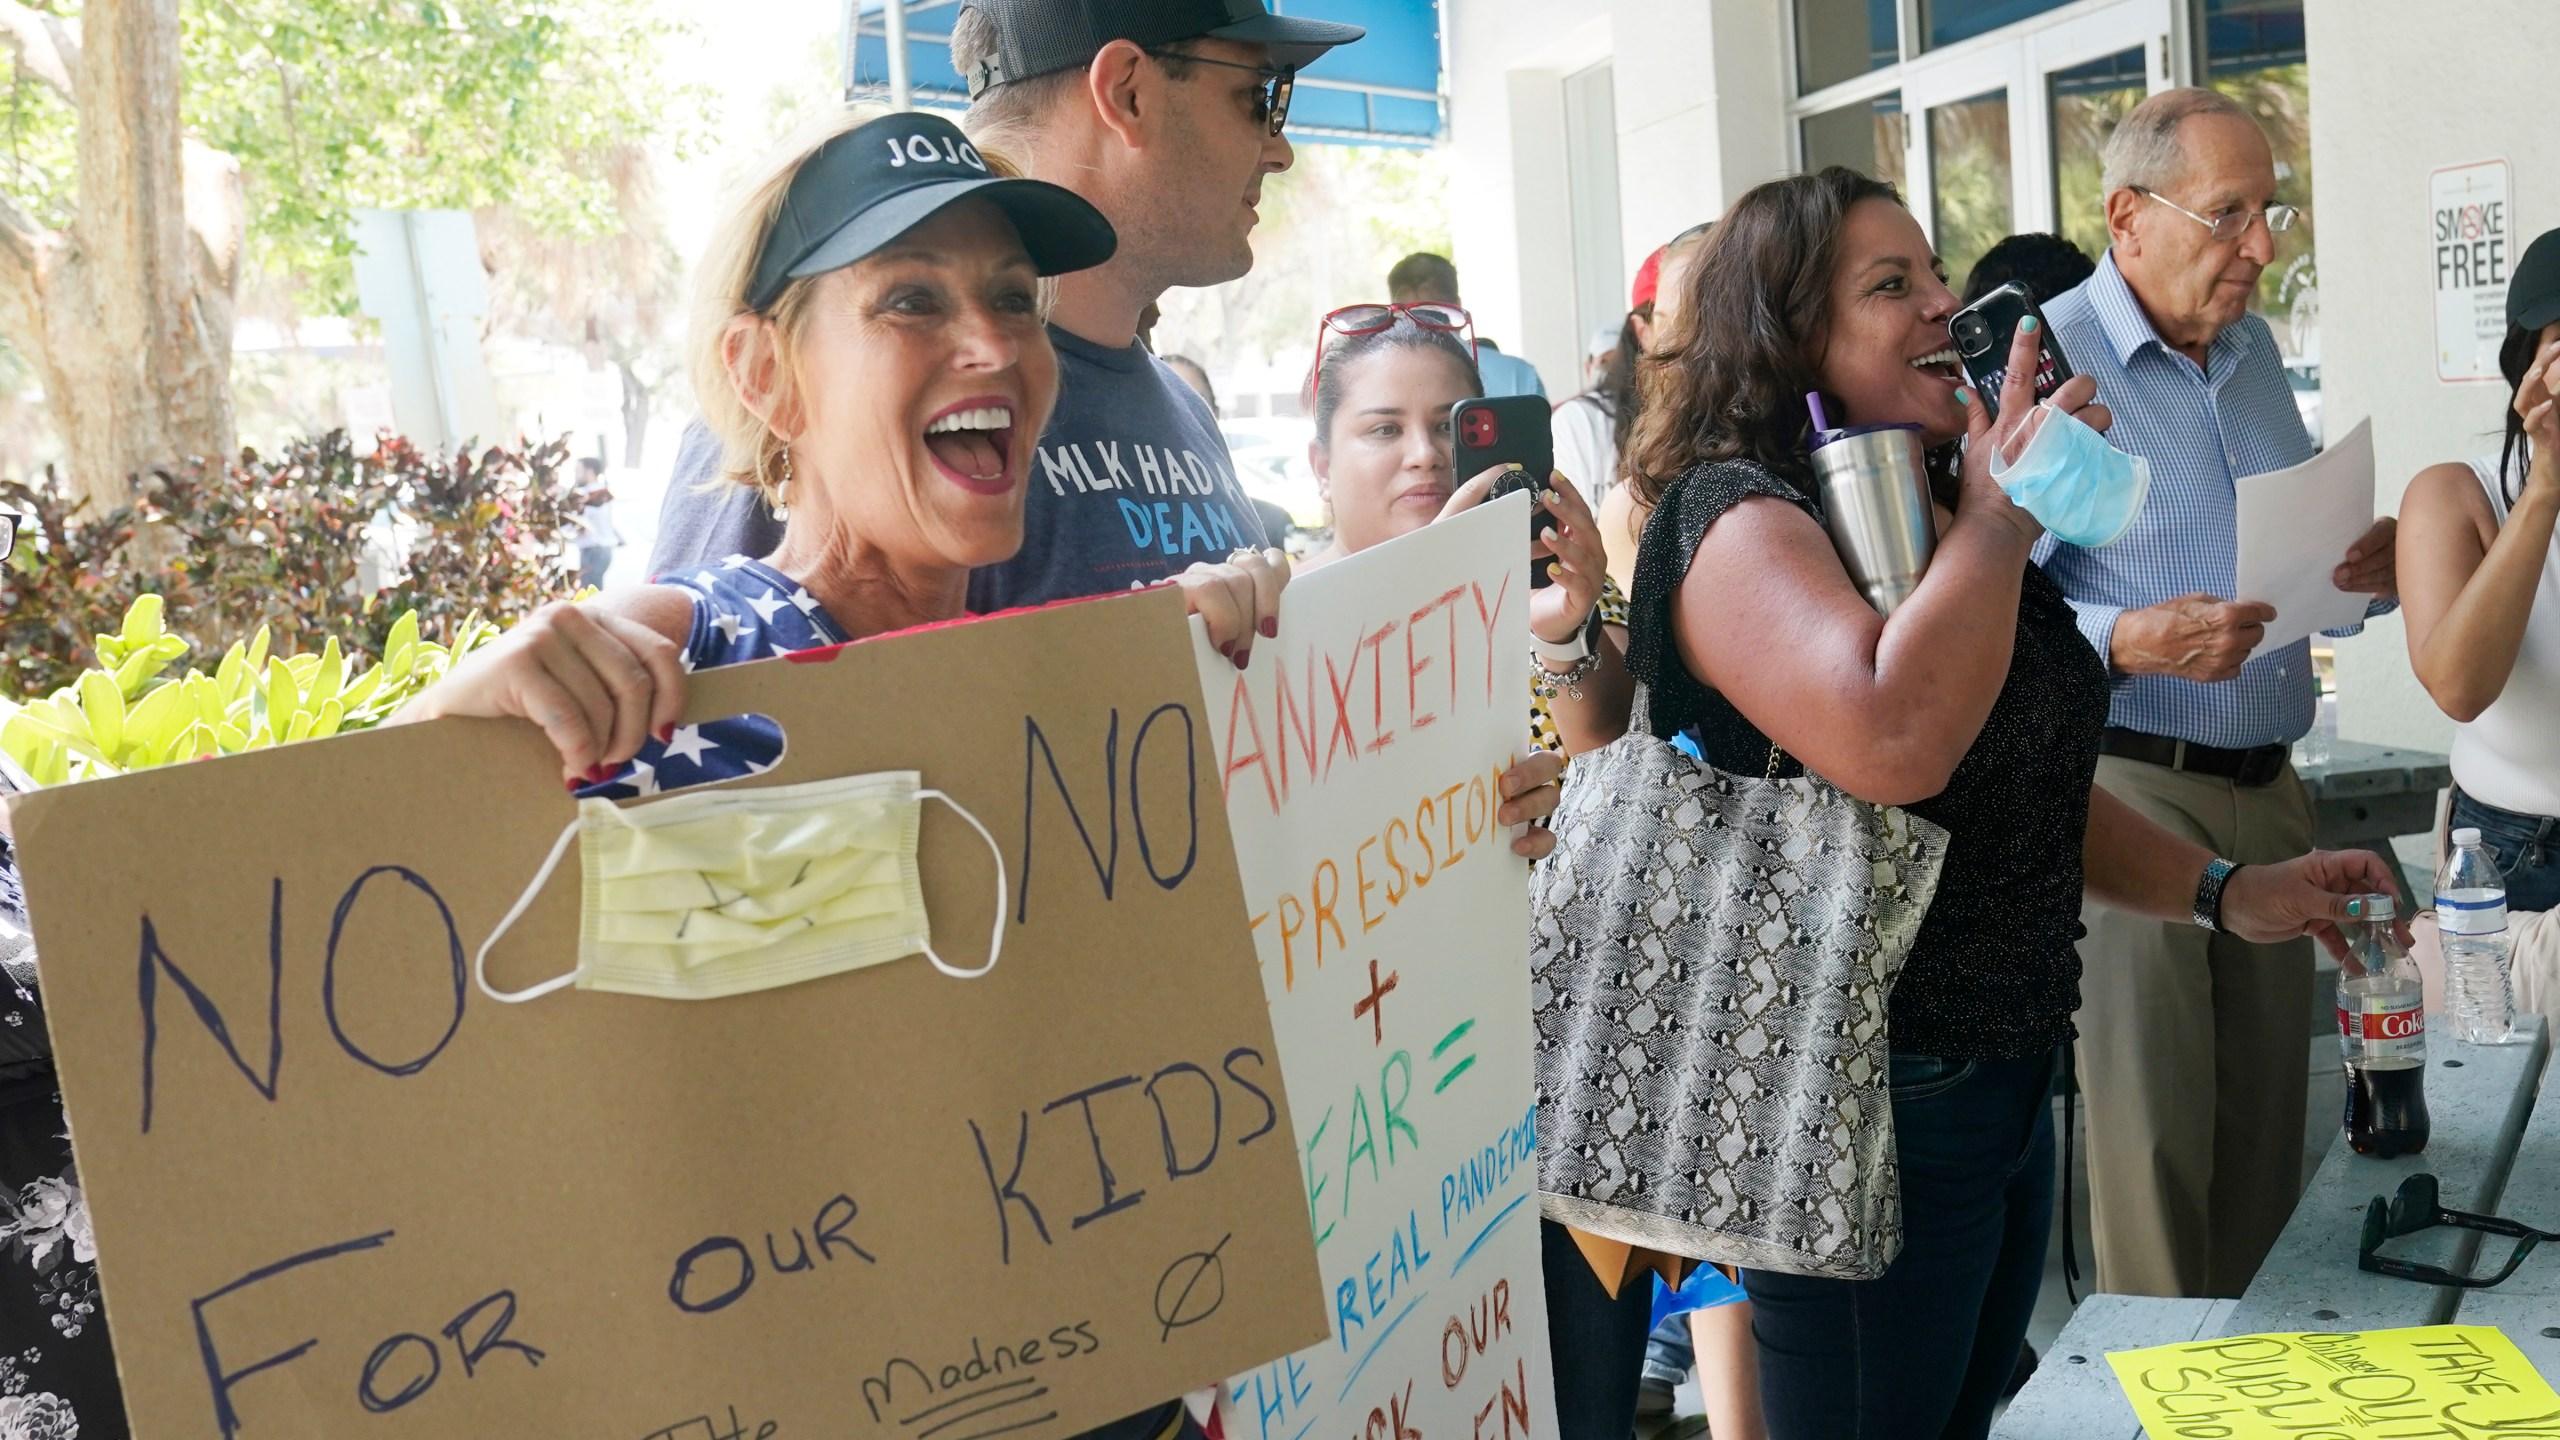 Joann Marcus of Fort Lauderdale, left, cheers as she listens to the Broward School Board's emergency meeting, Wednesday, July 28, 2021, in Fort Lauderdale, Fla. (AP Photo/Marta Lavandier)